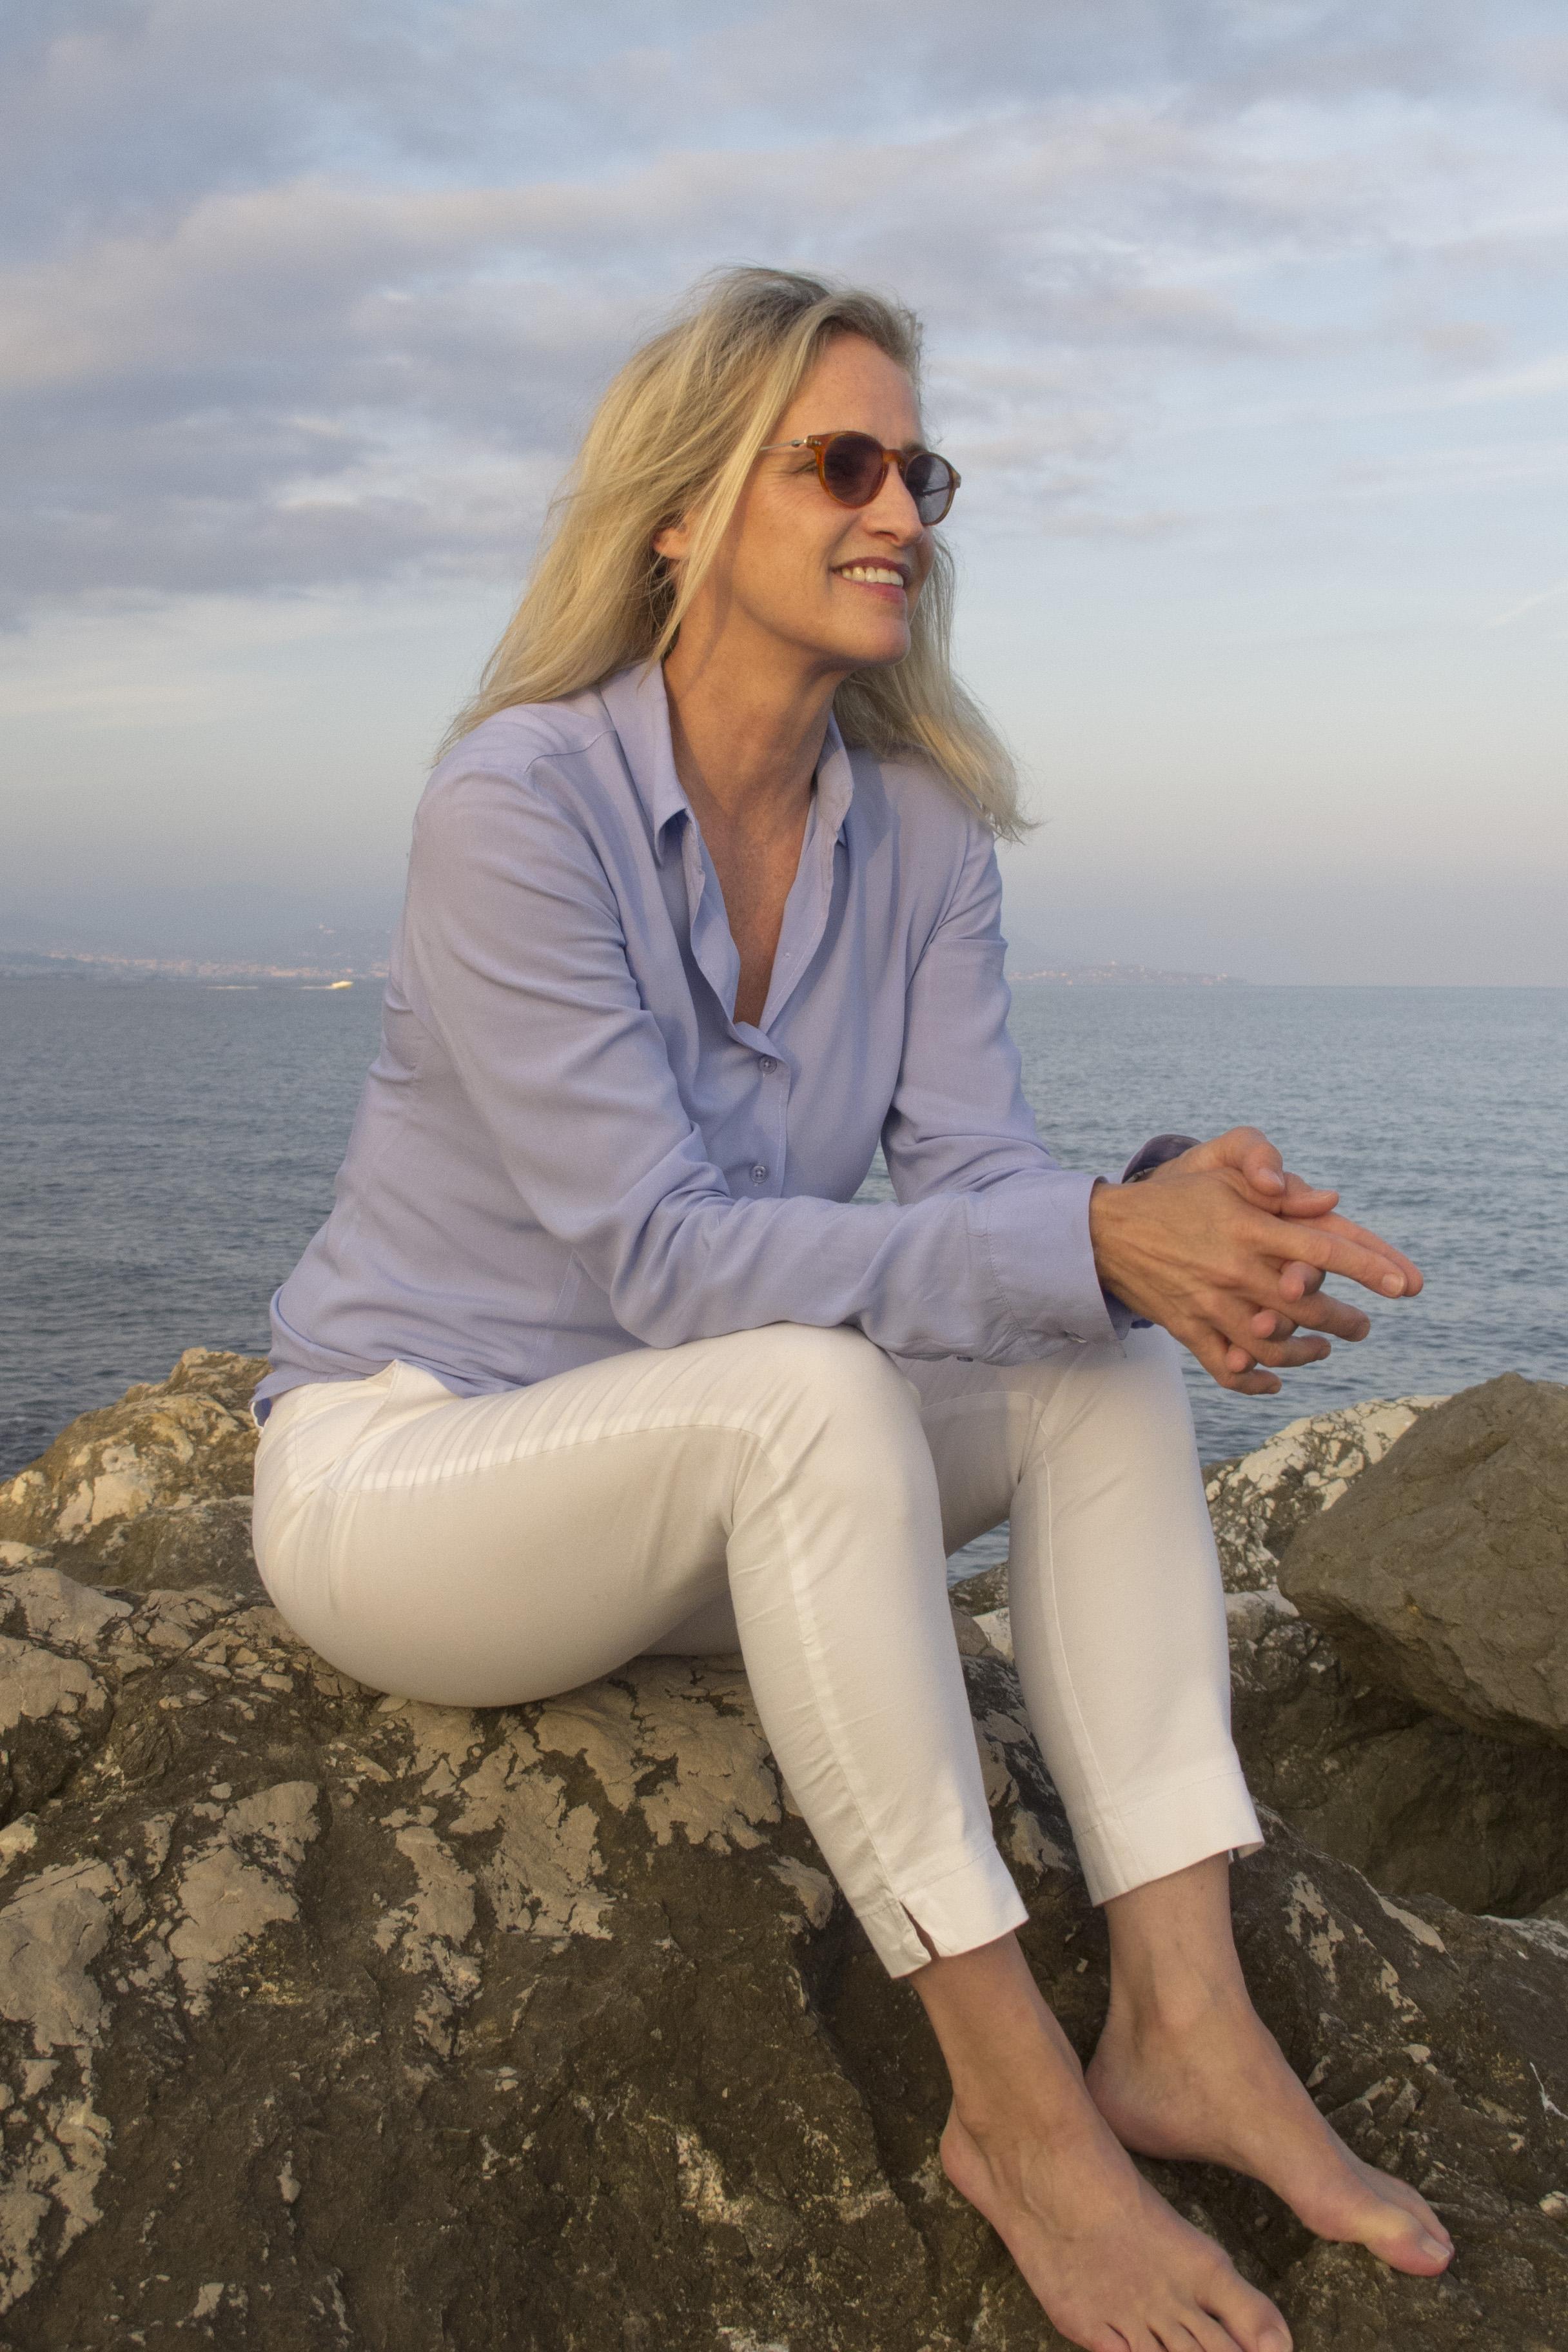 717-Lena in Antibes